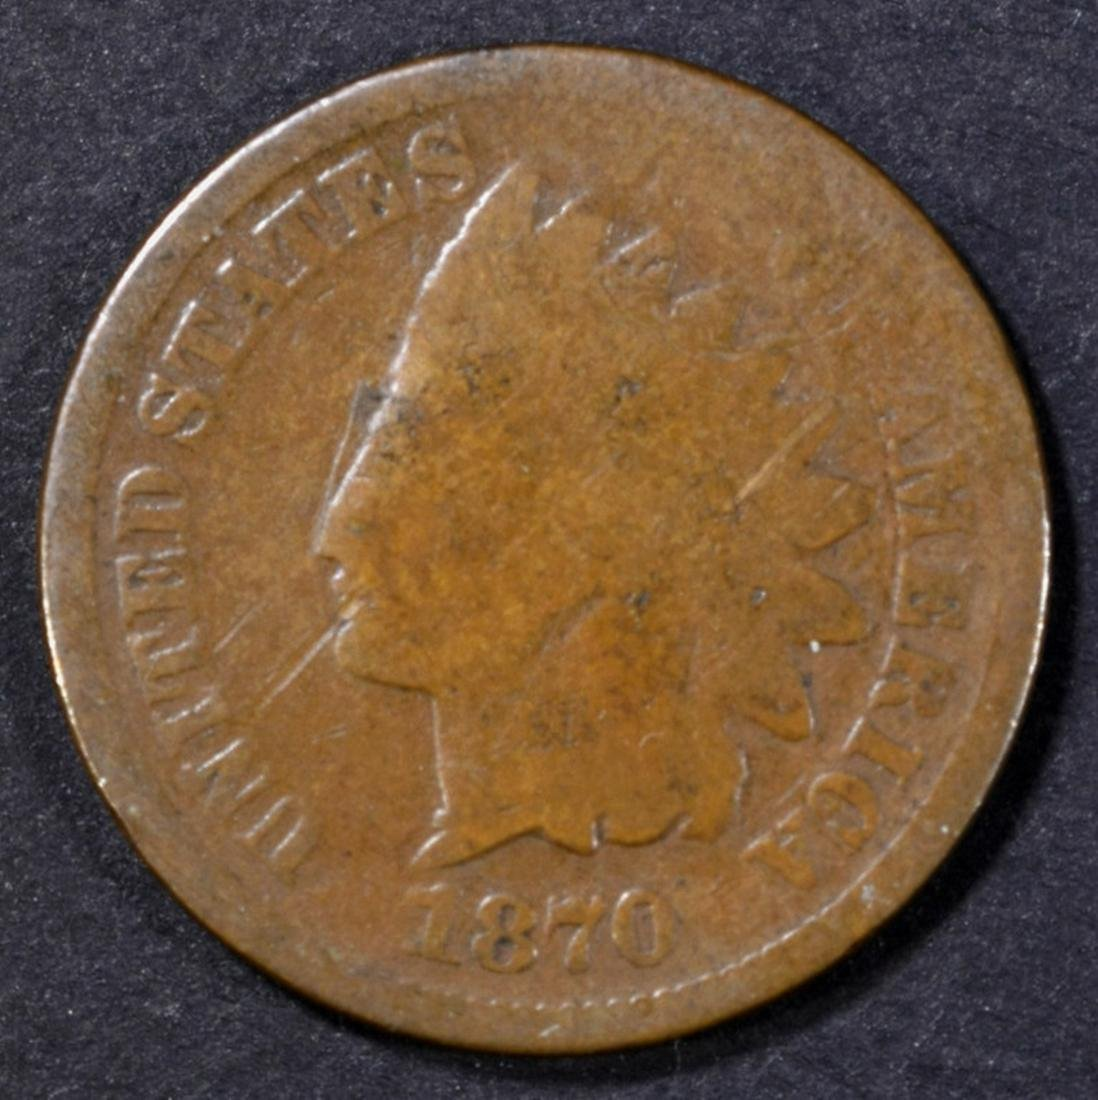 1870 INDIAN CENT GOOD